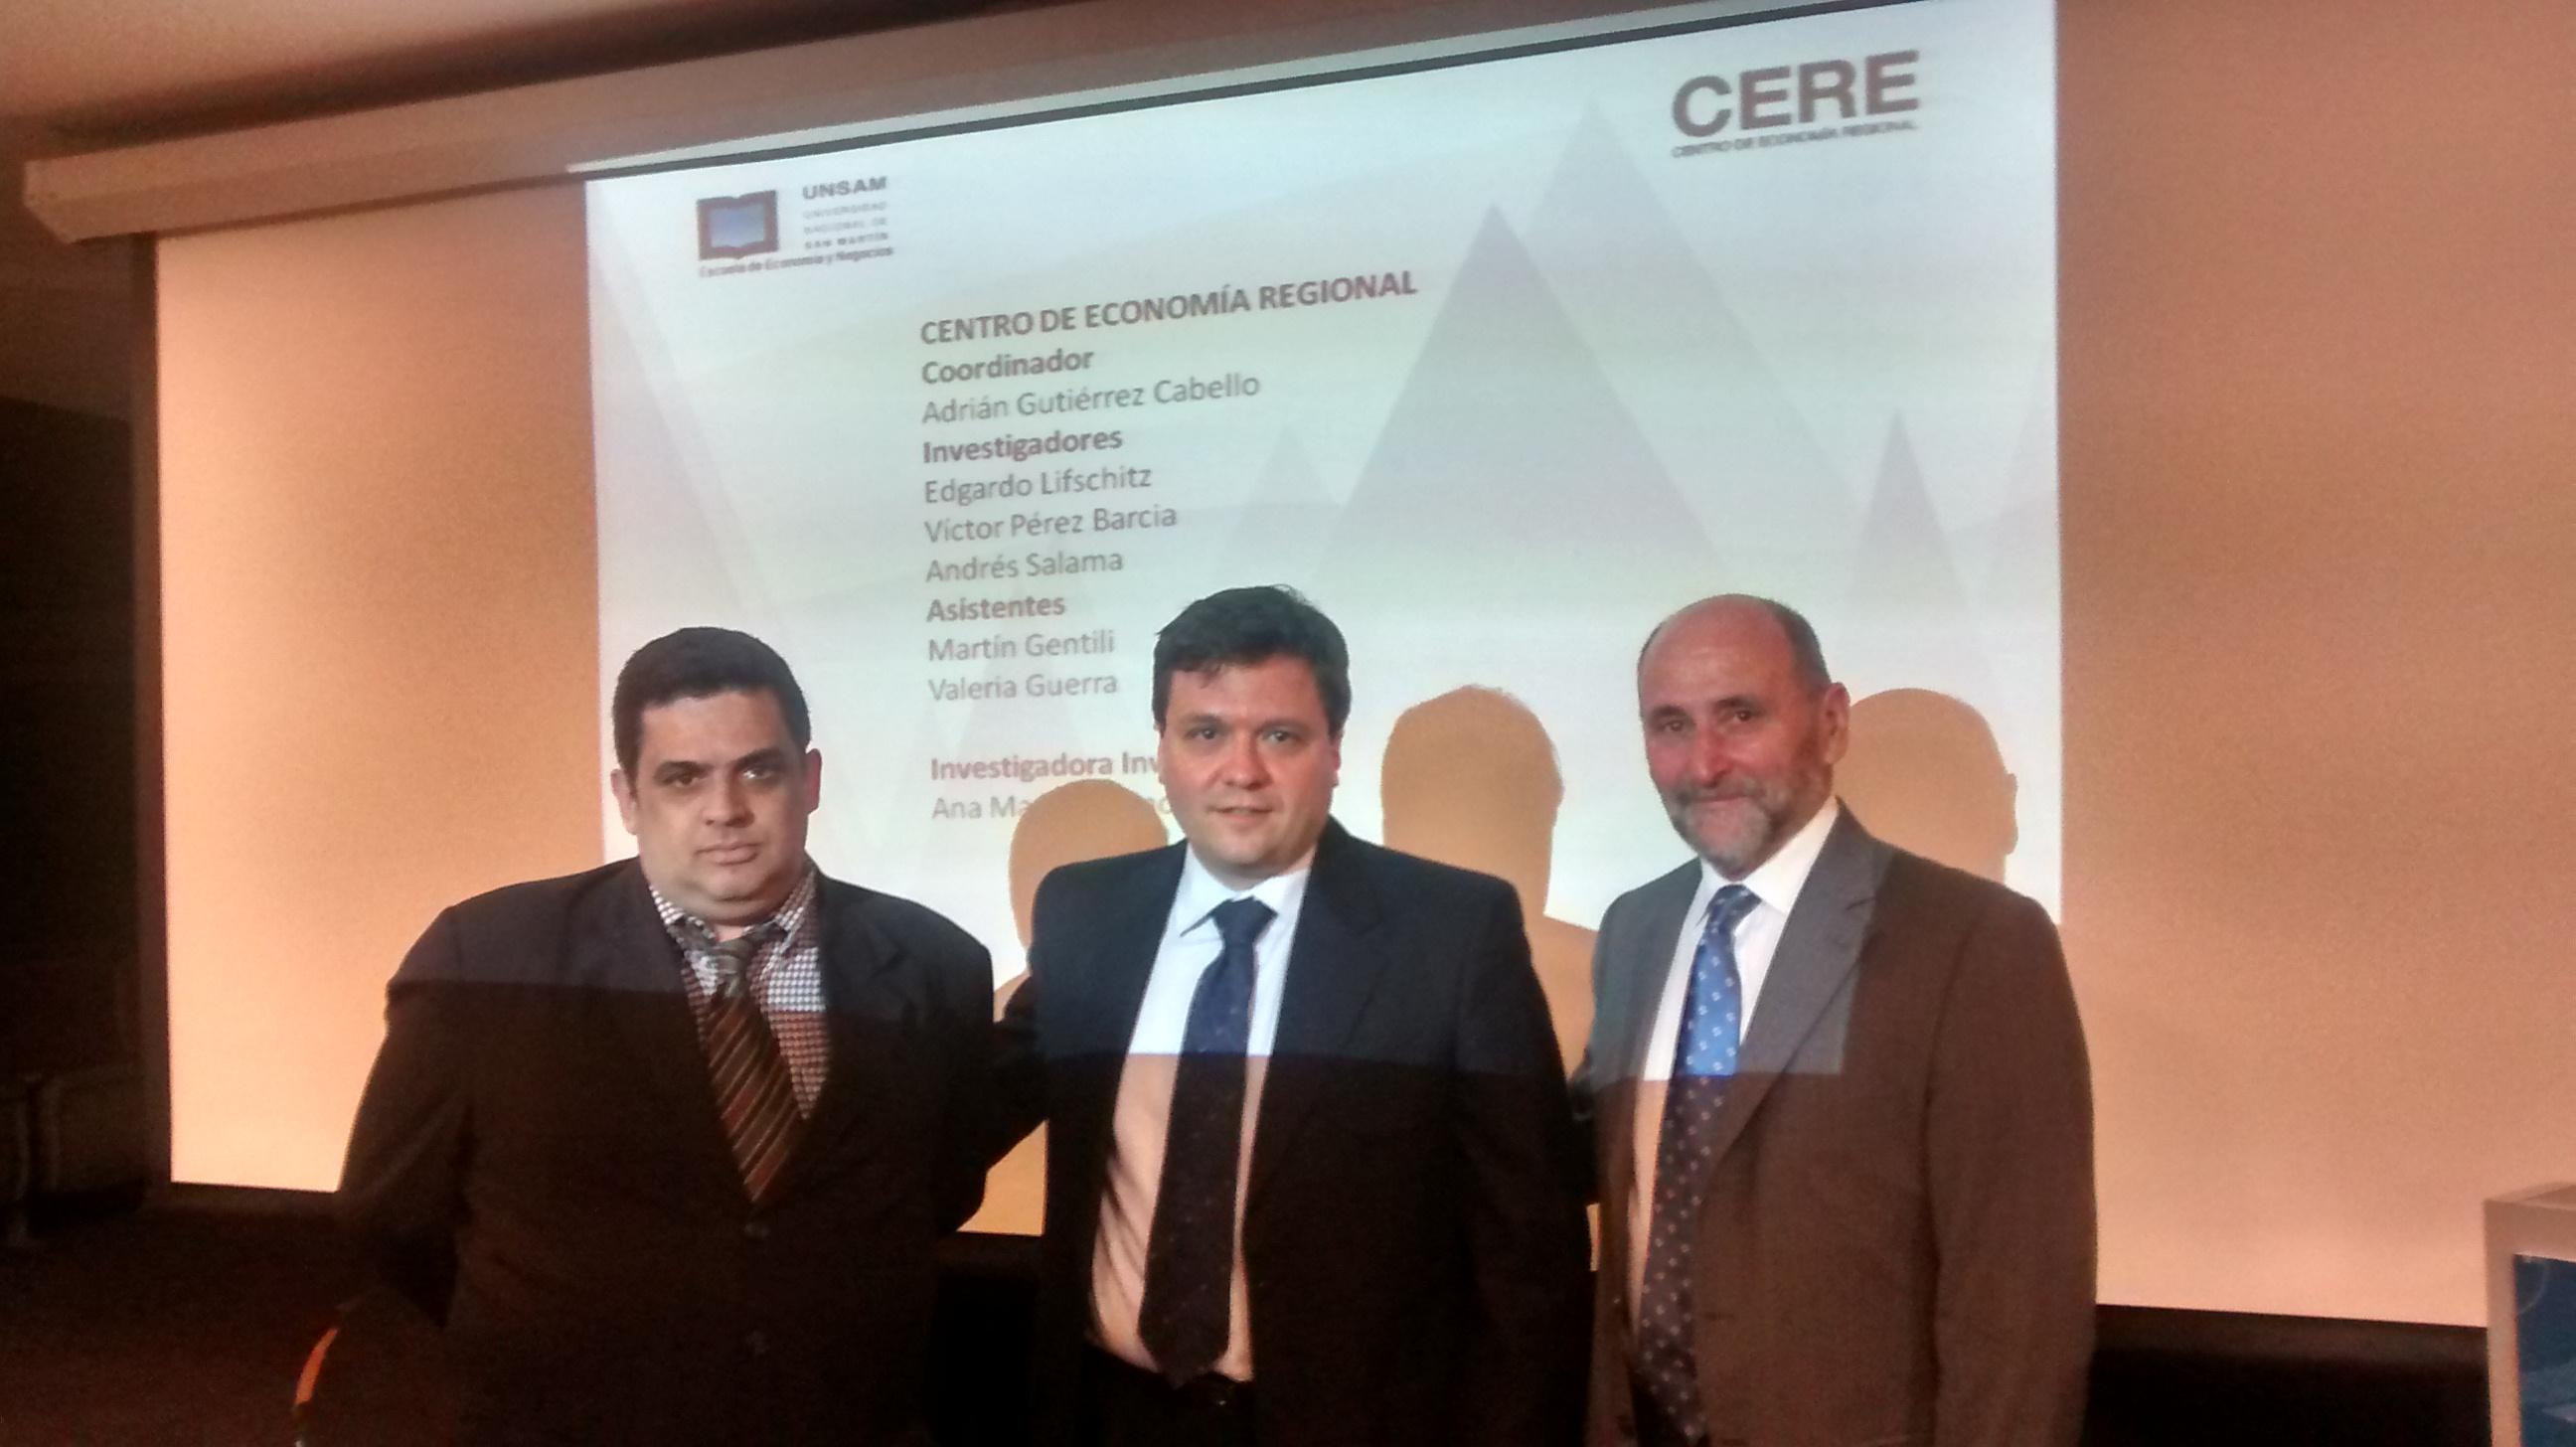 Andrés Salama, Adrian Gutiérrez Cabello y Edgardo Lifschitz